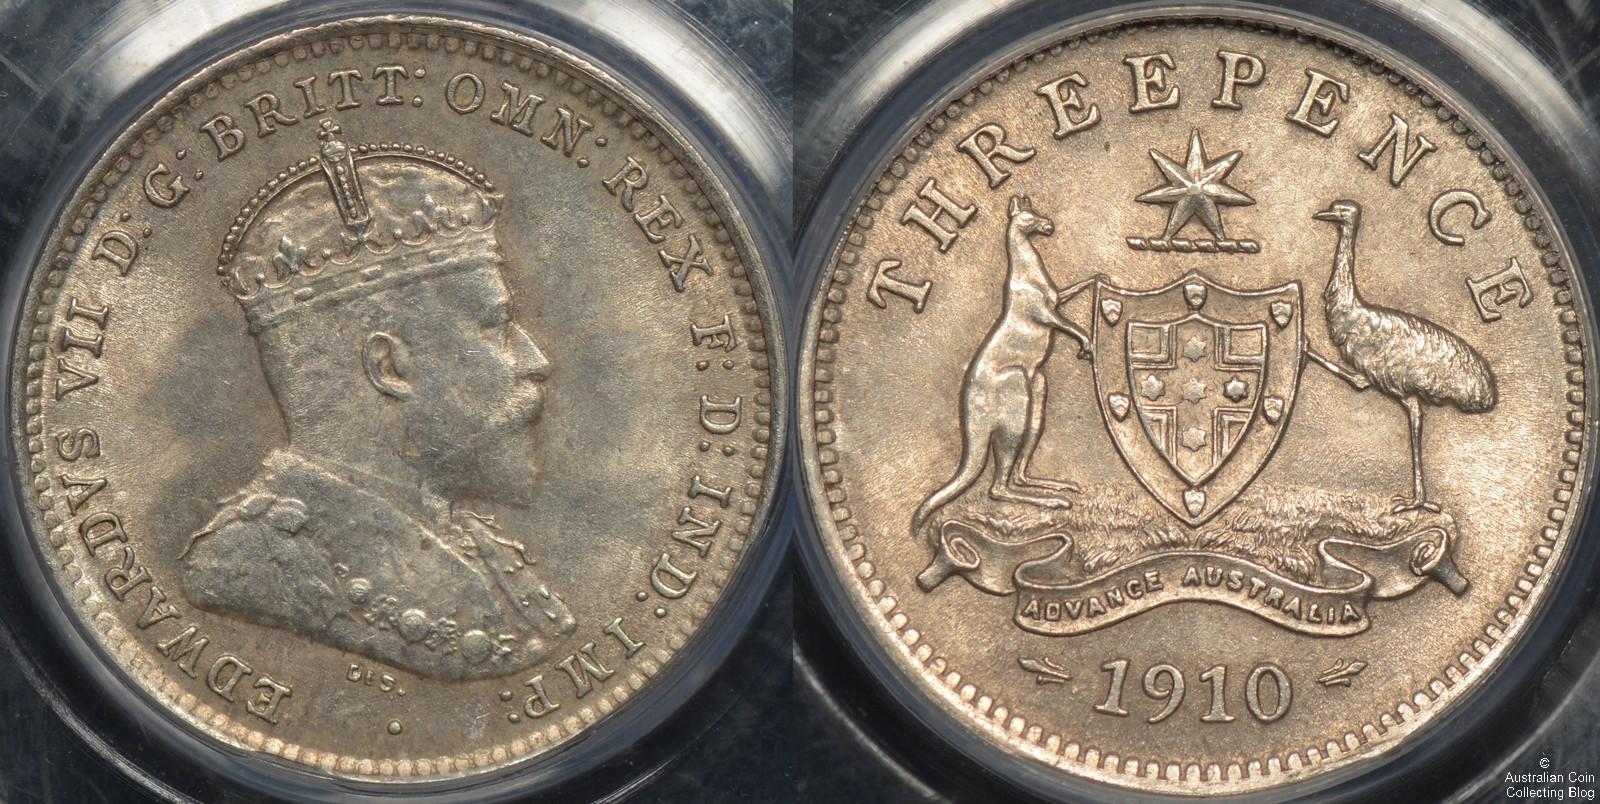 Australia 1910 Threepence PCGS MS63